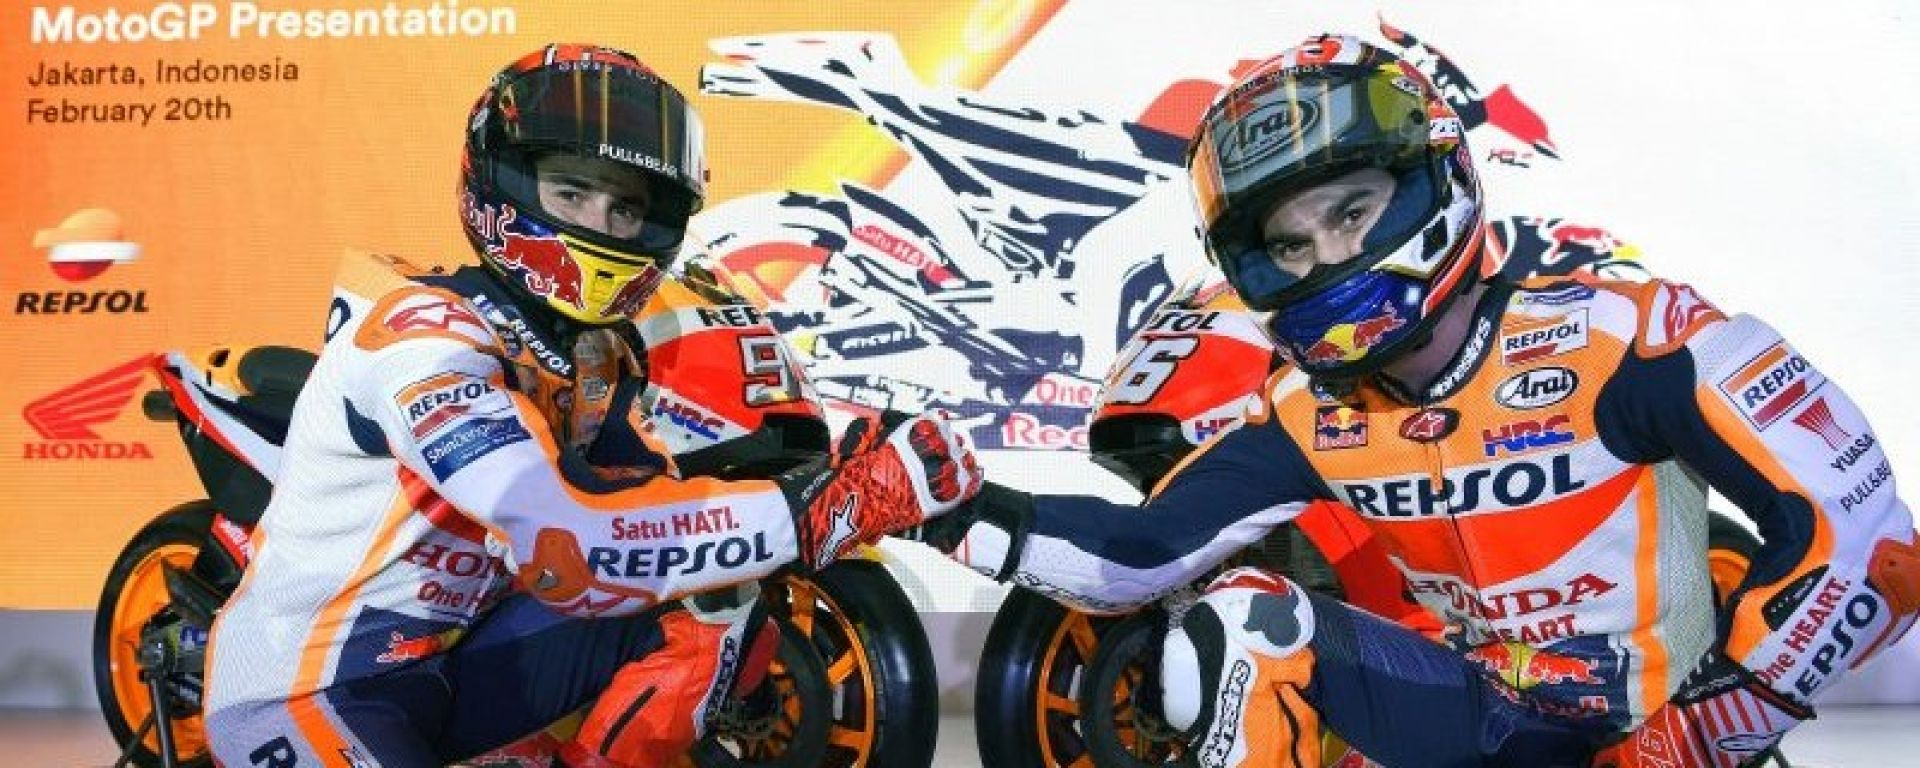 Team Honda Repsol 2018